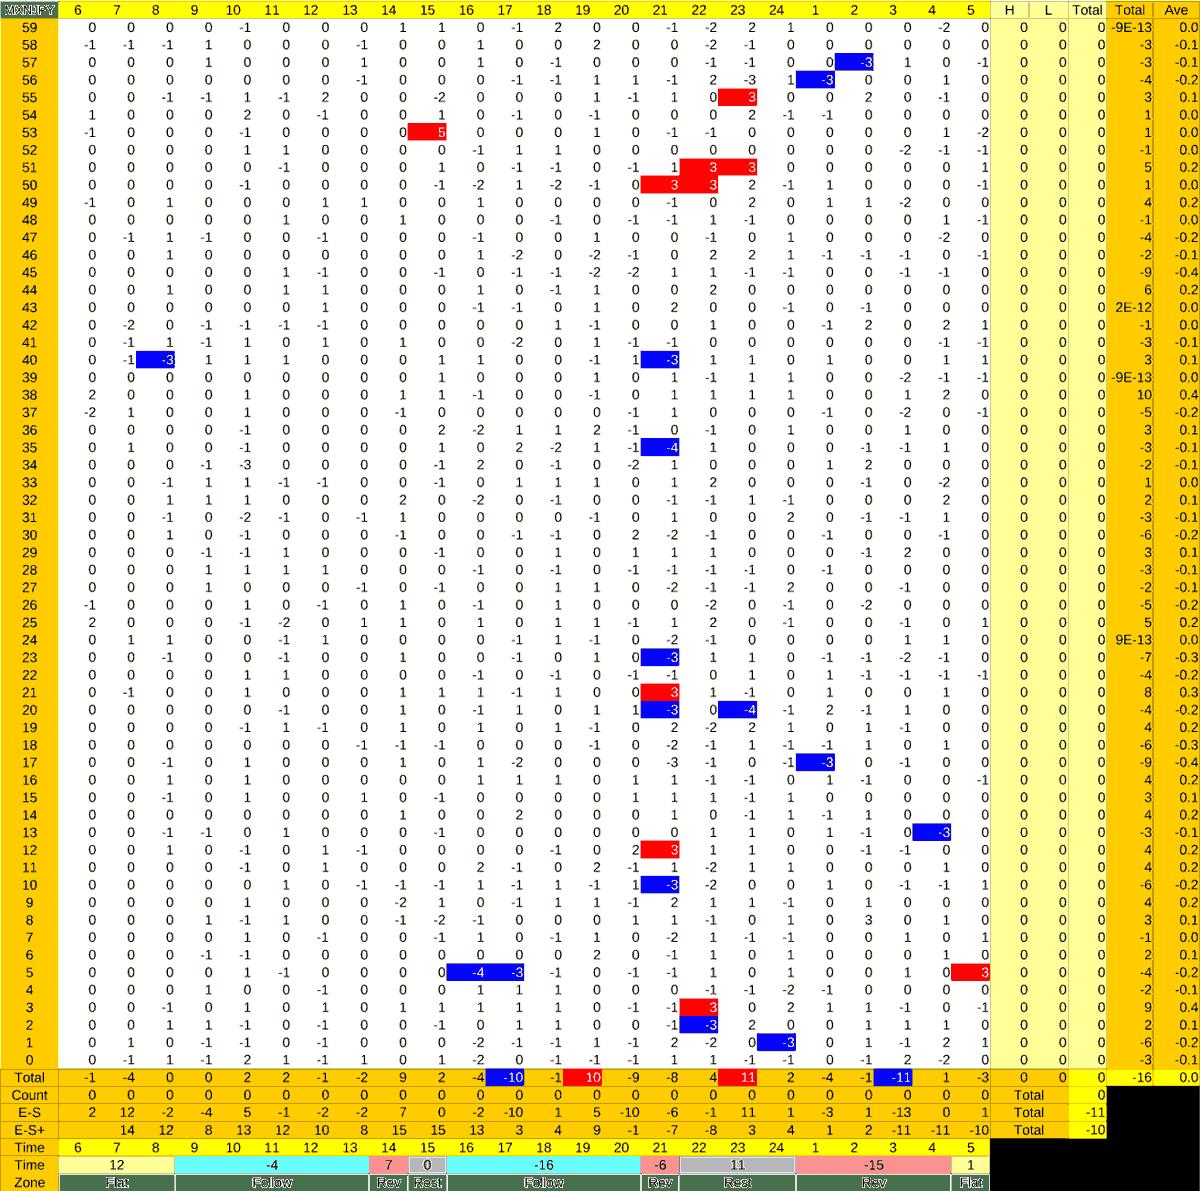 20210427_HS(3)MXNJPY